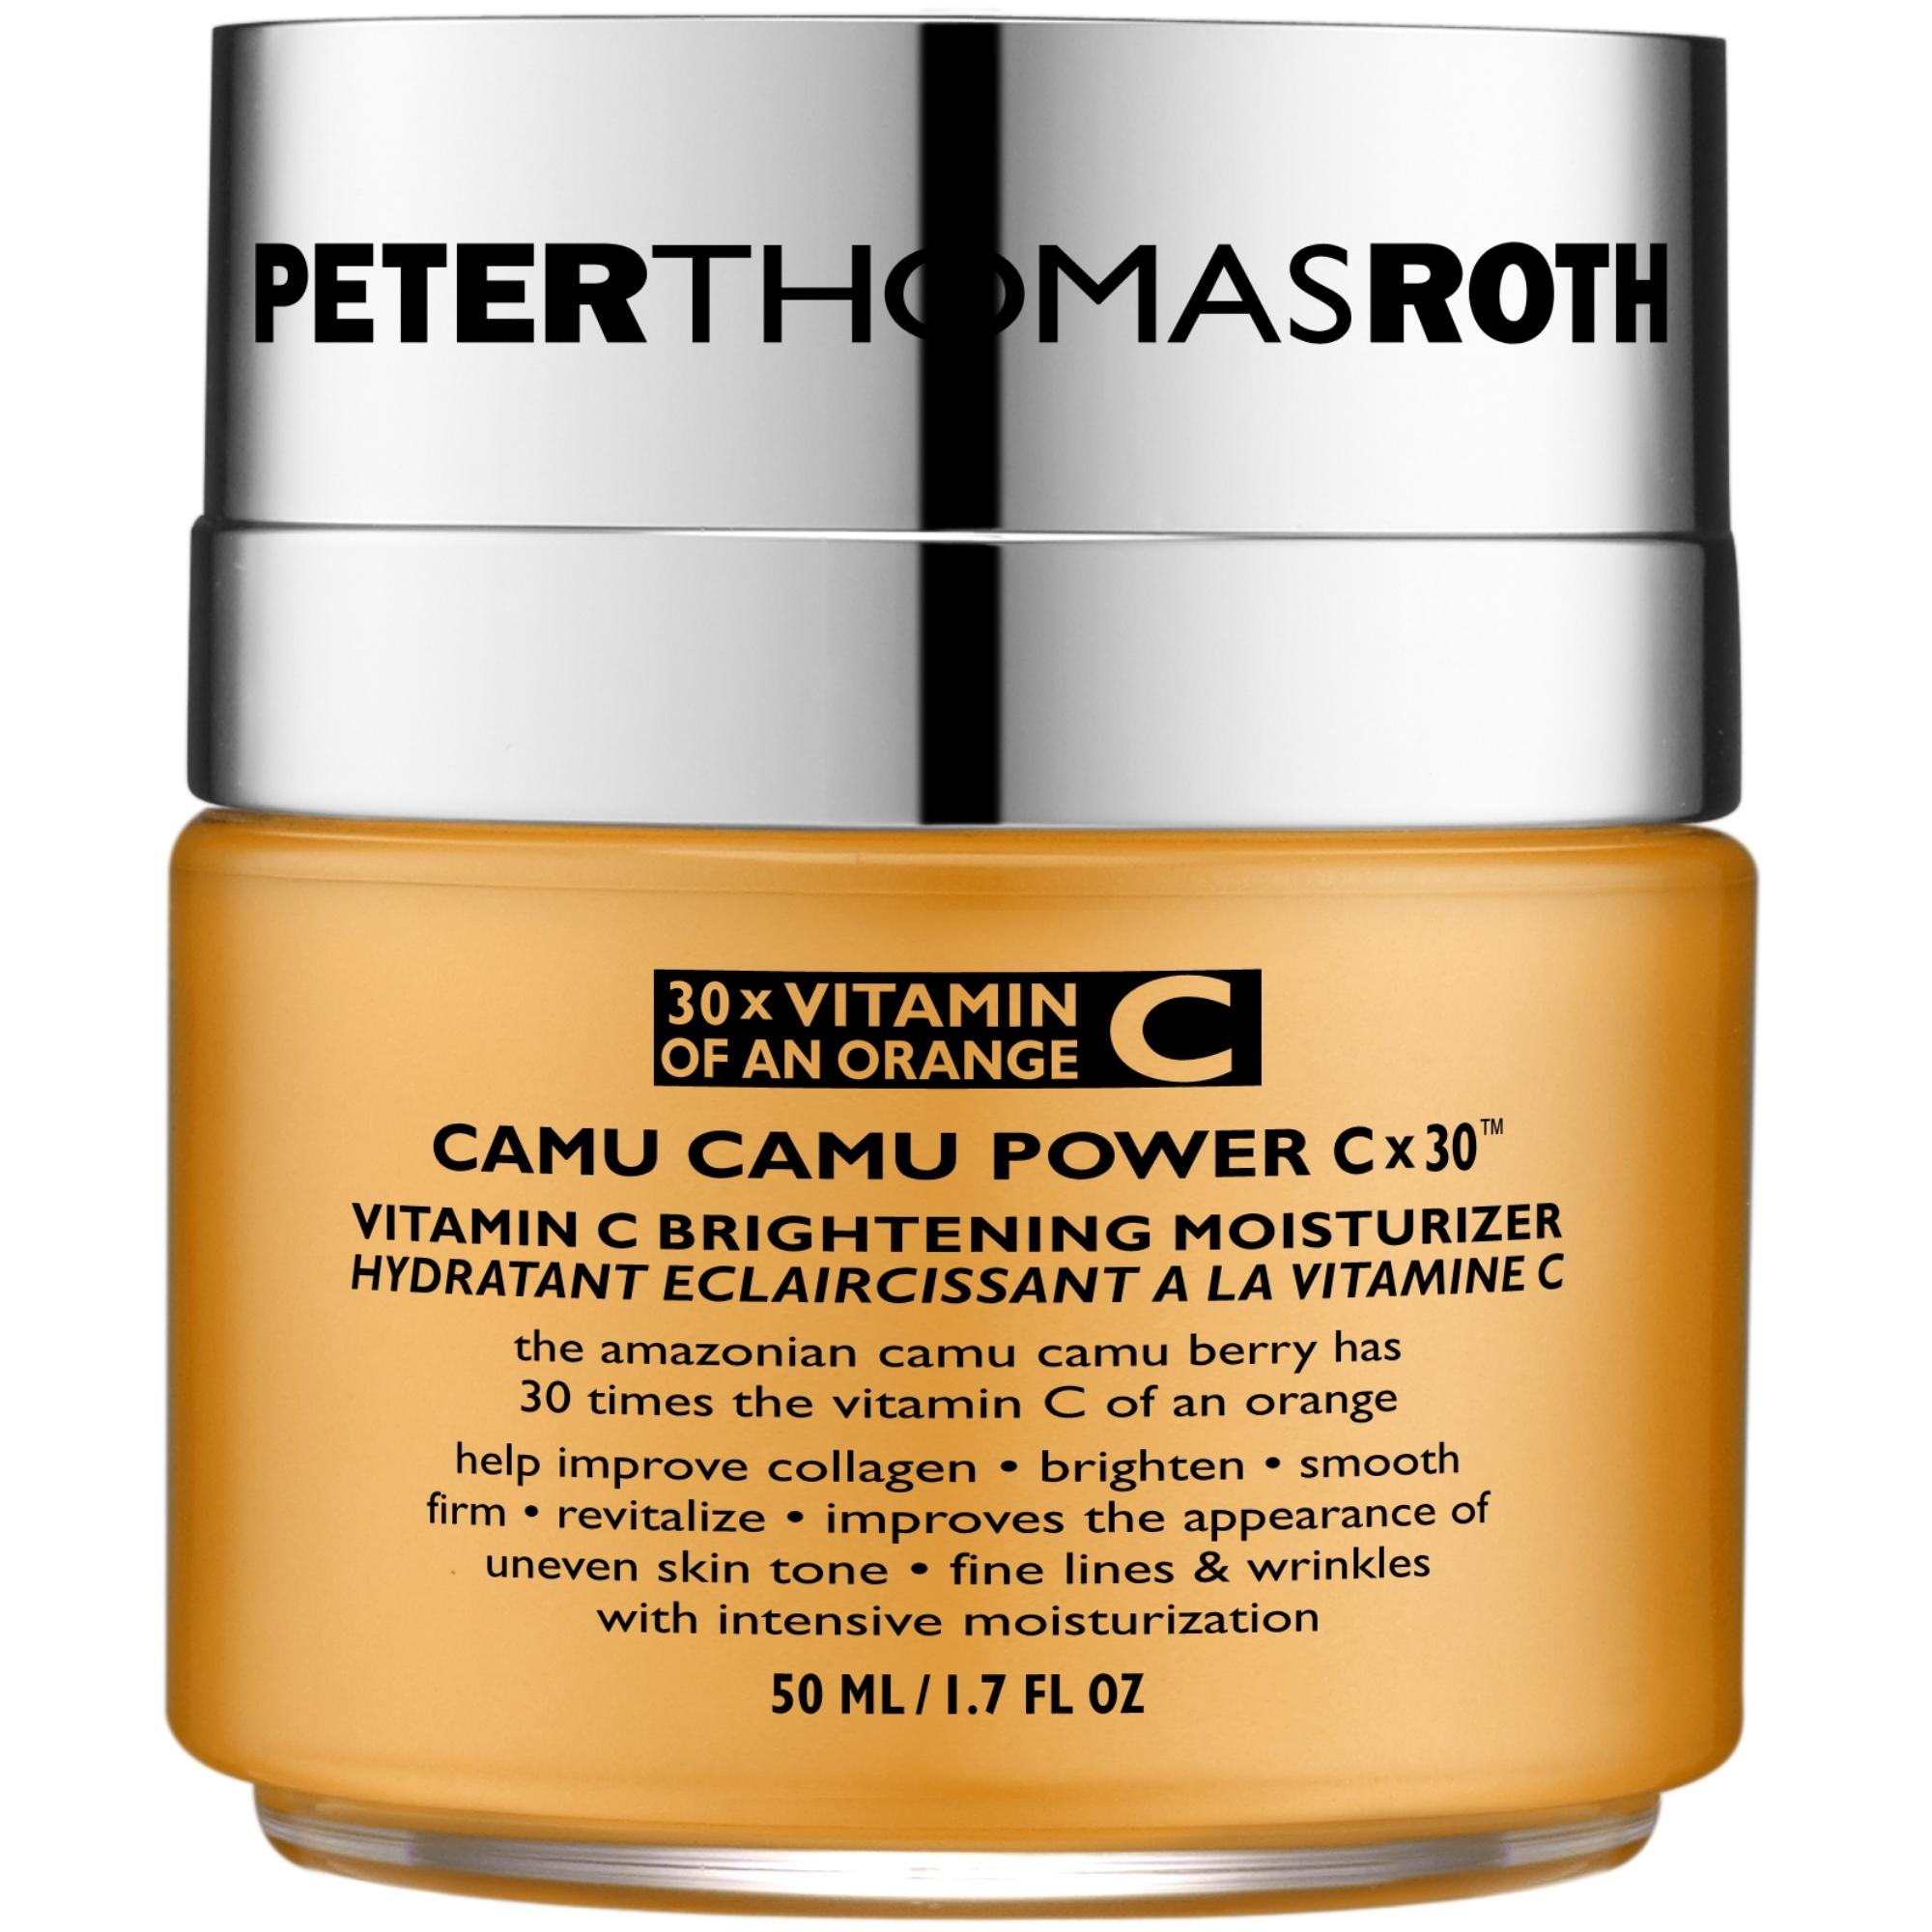 Camu Camu Power Cx30 Vitamin C  Brightening Moisturizer 50ml